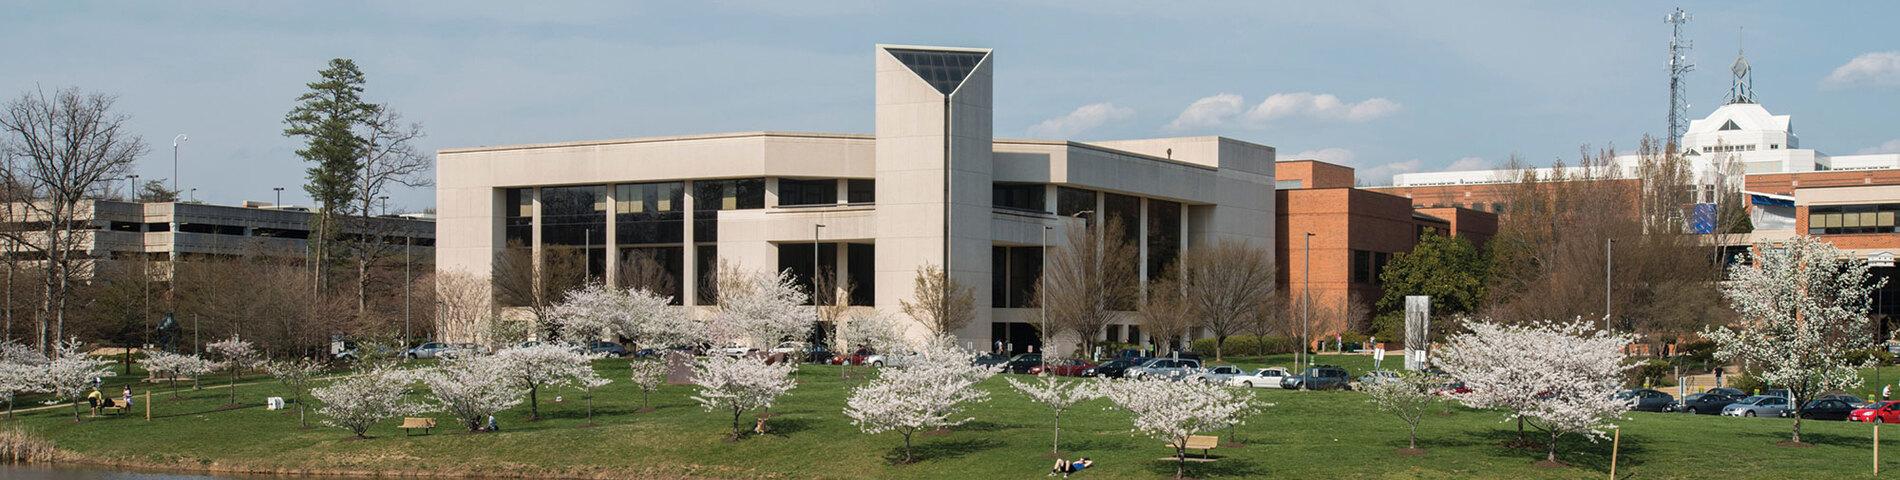 INTO George Mason University图片1